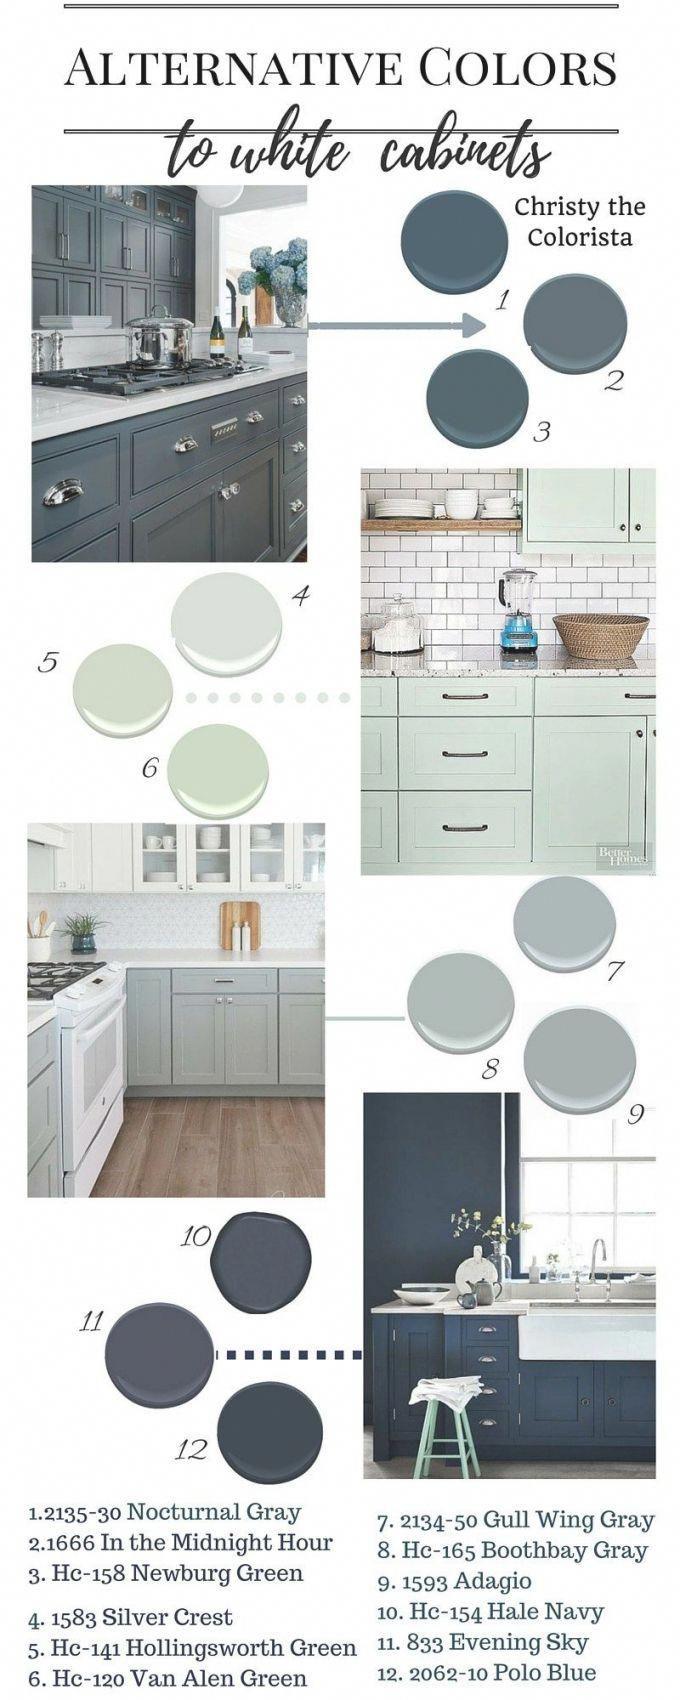 Exterior Of Homes Designs Exterior Designs Pinterest Paint Throughout Best Blue Gr Grey Blue Kitchen Kitchen Paint Colors Painted Kitchen Cabinets Colors